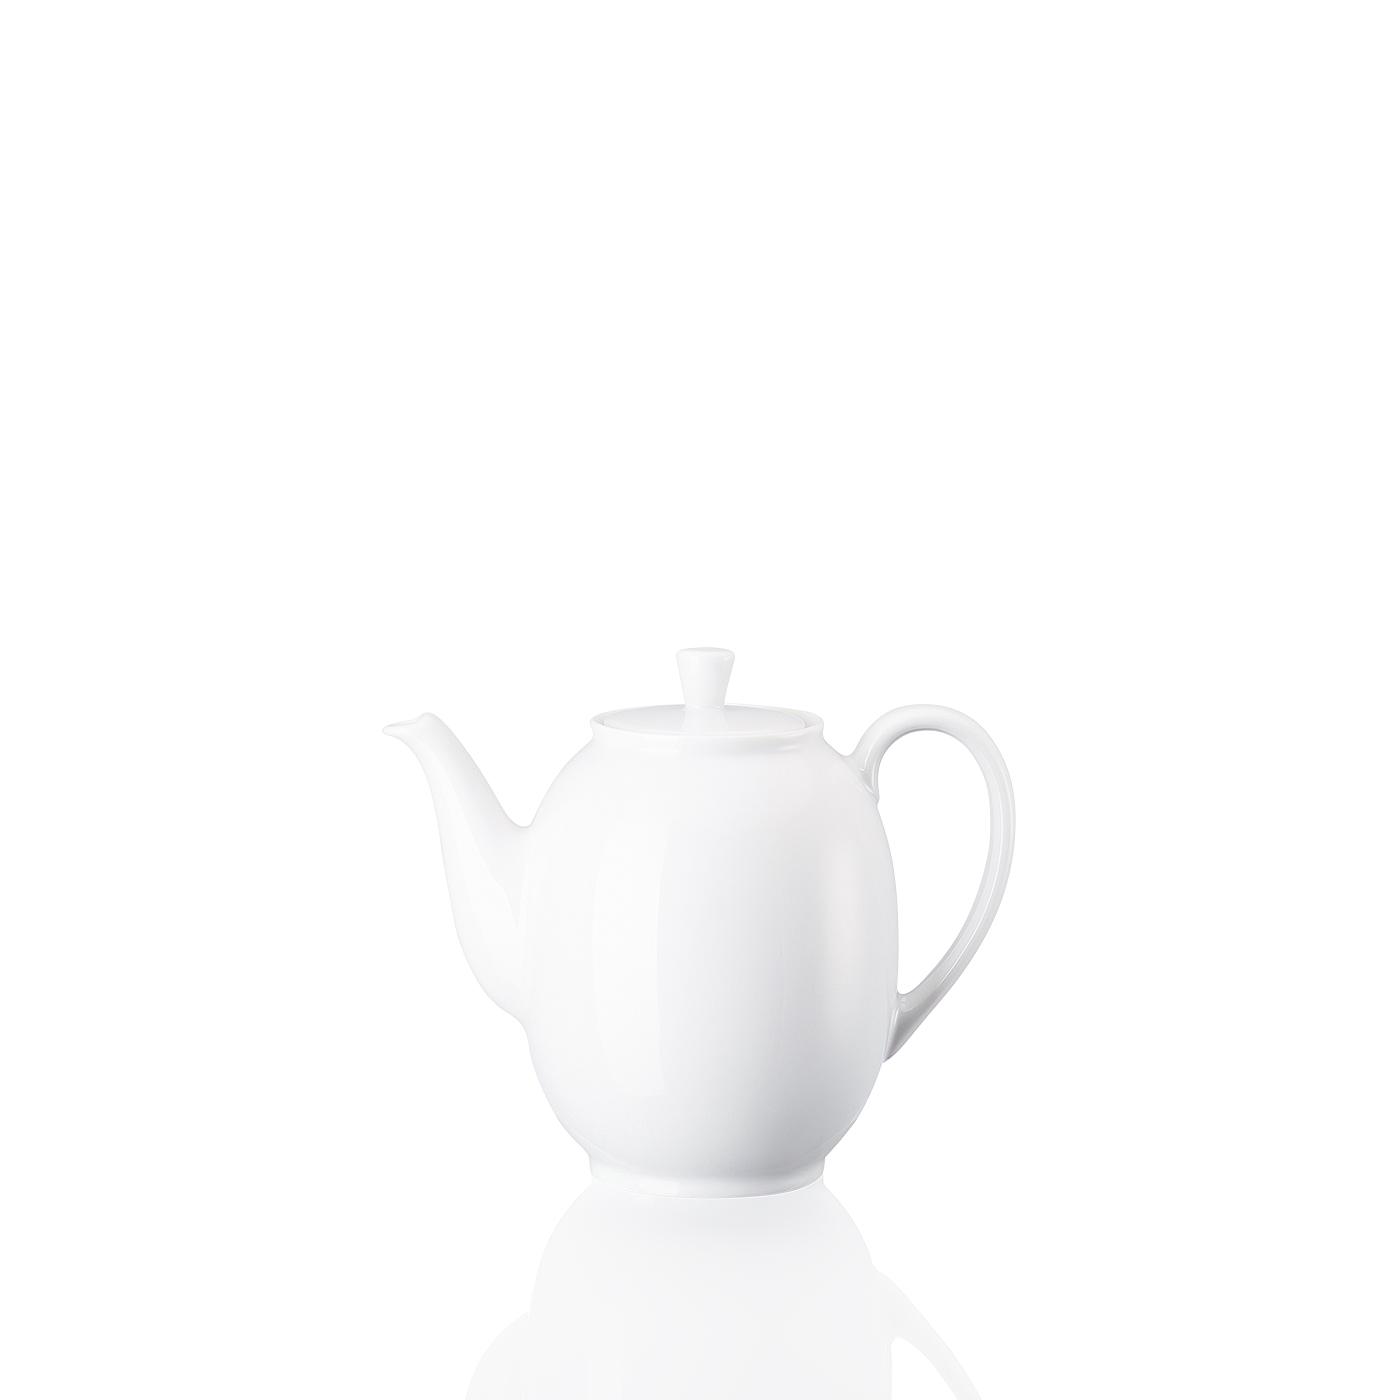 Kaffeekanne 2 P. Form 1382 Weiss Arzberg